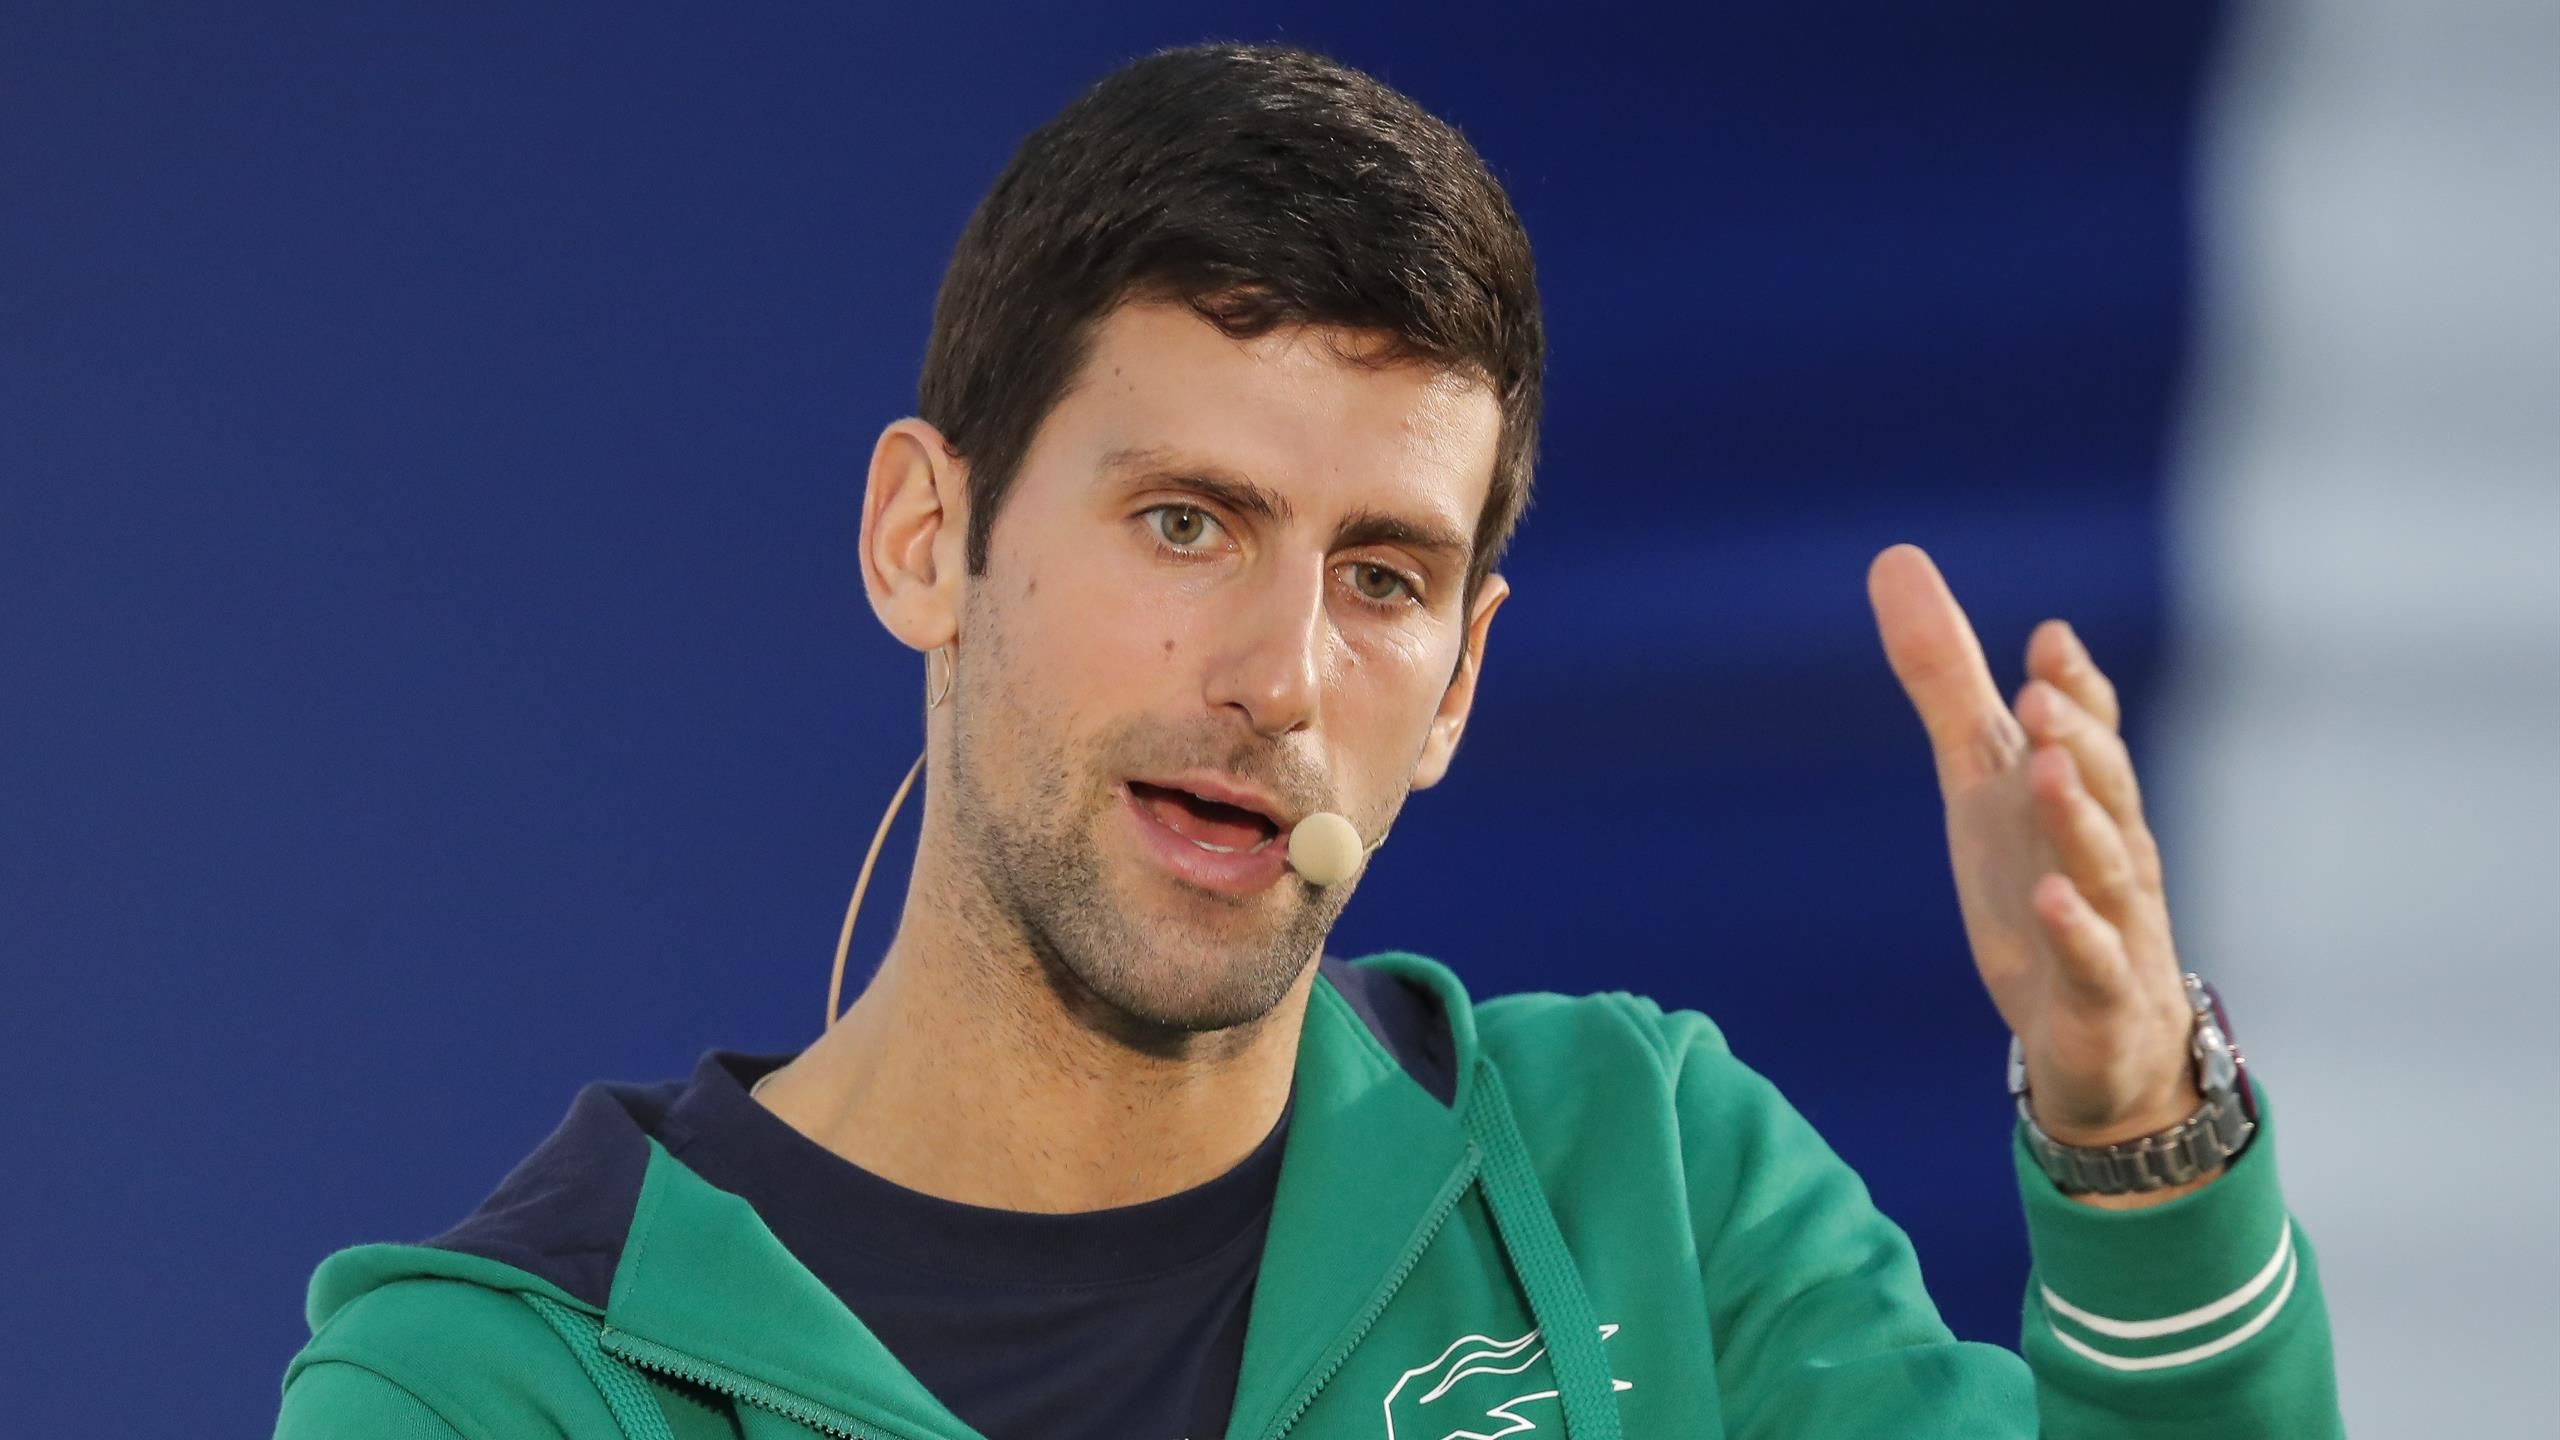 Tennis News Novak Djokovic Marbella Club Apologises To Serbian Over Lockdown Confusion Eurosport